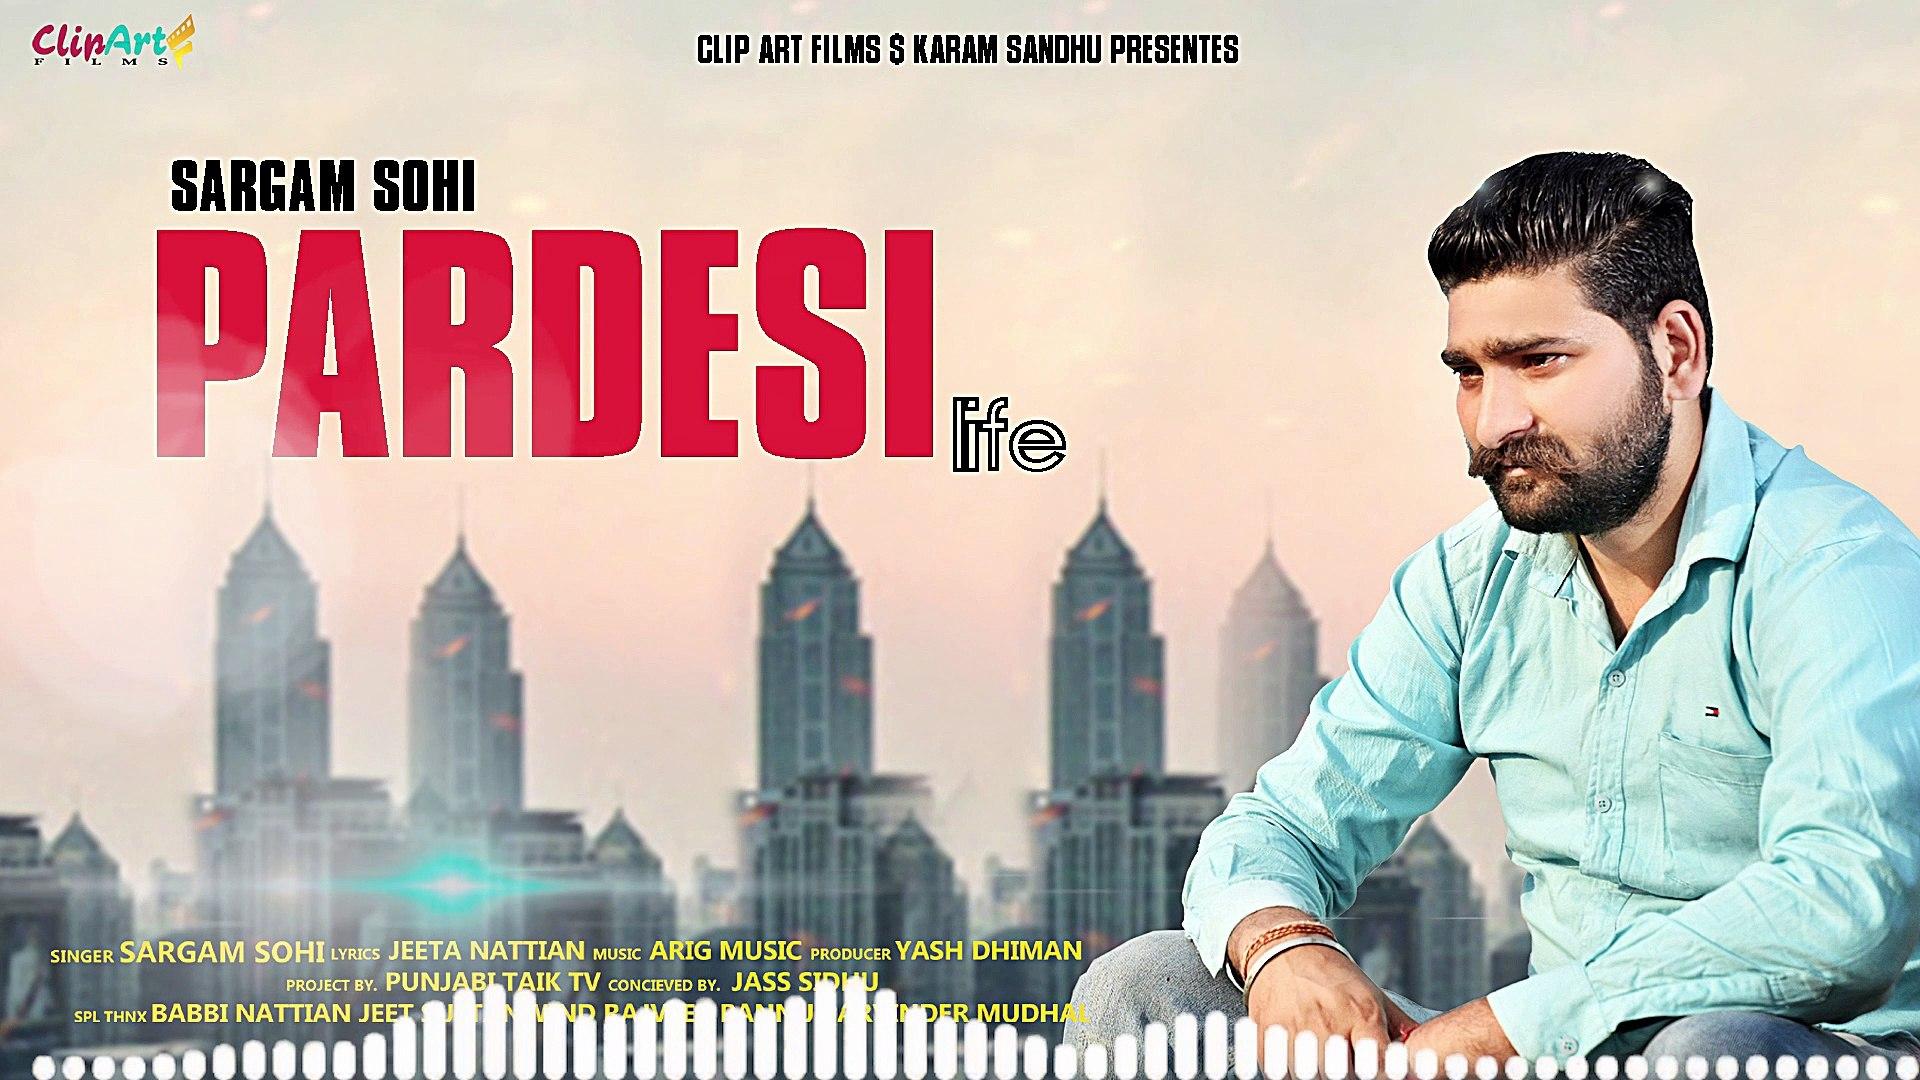 New Song | Pardesi Life | Sargam Sohi | Arig Music | Latest Song 2020